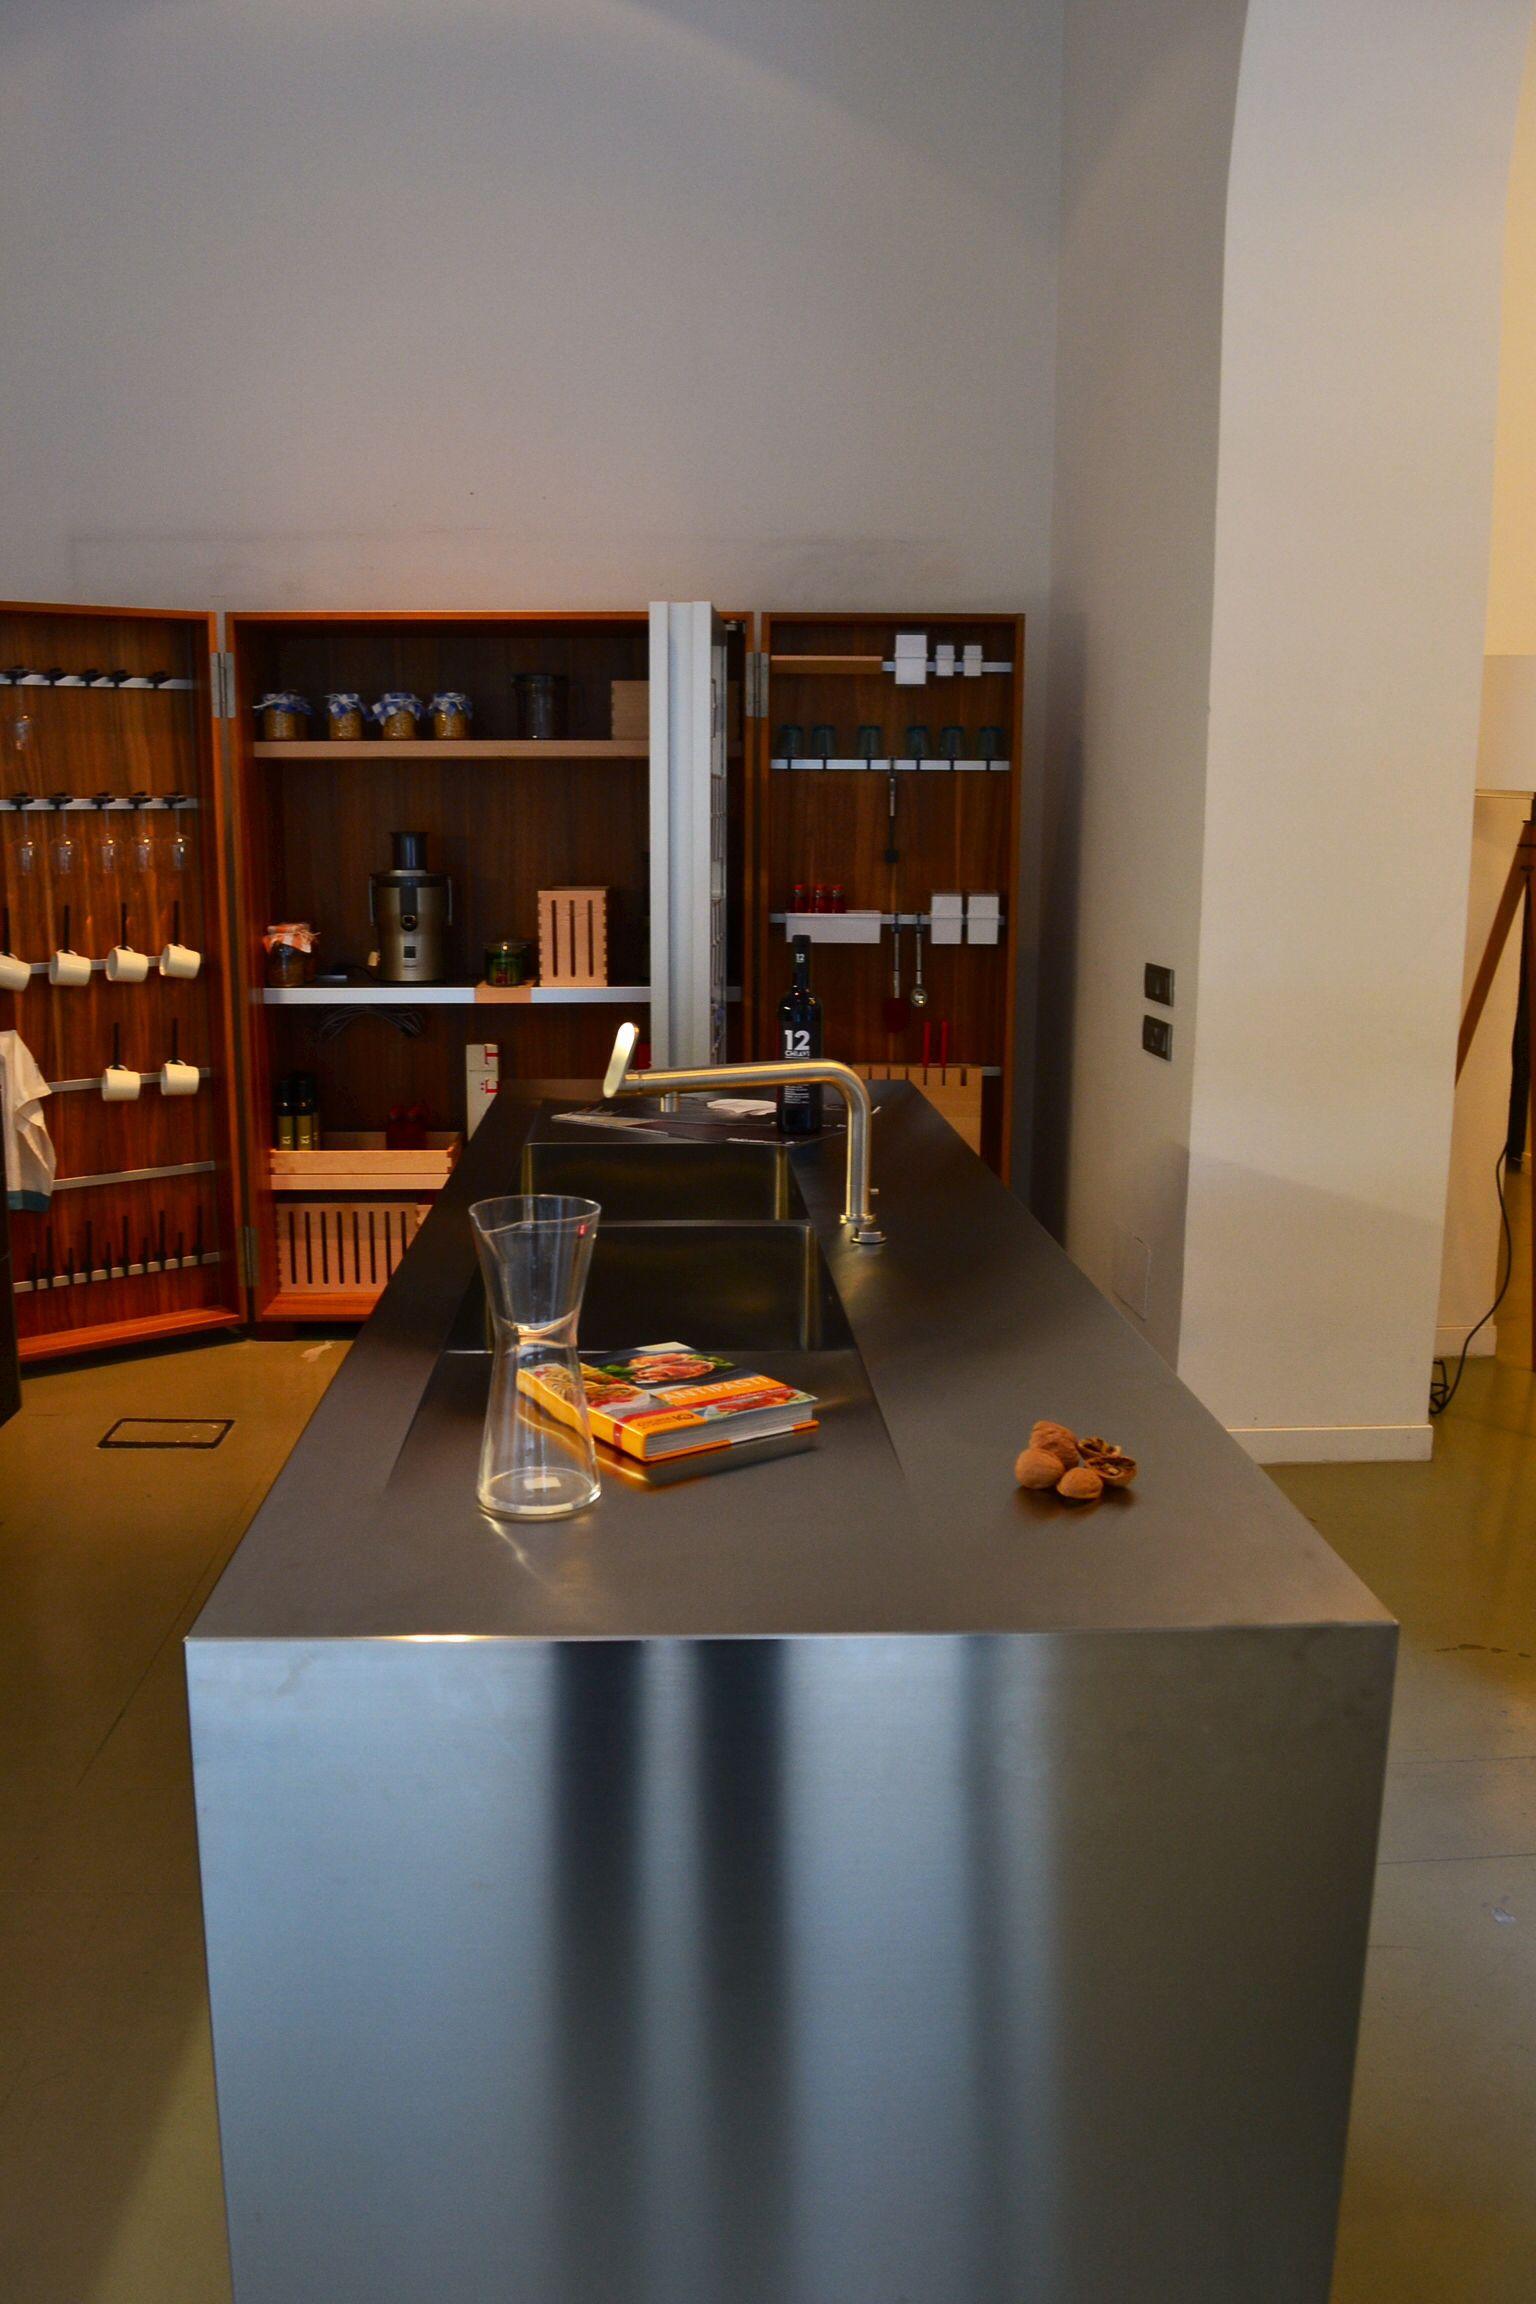 Tavoli Da Cucina Palermo.Bulthaup Palermo Bulthaup Cuisine Design Kitchen Design E